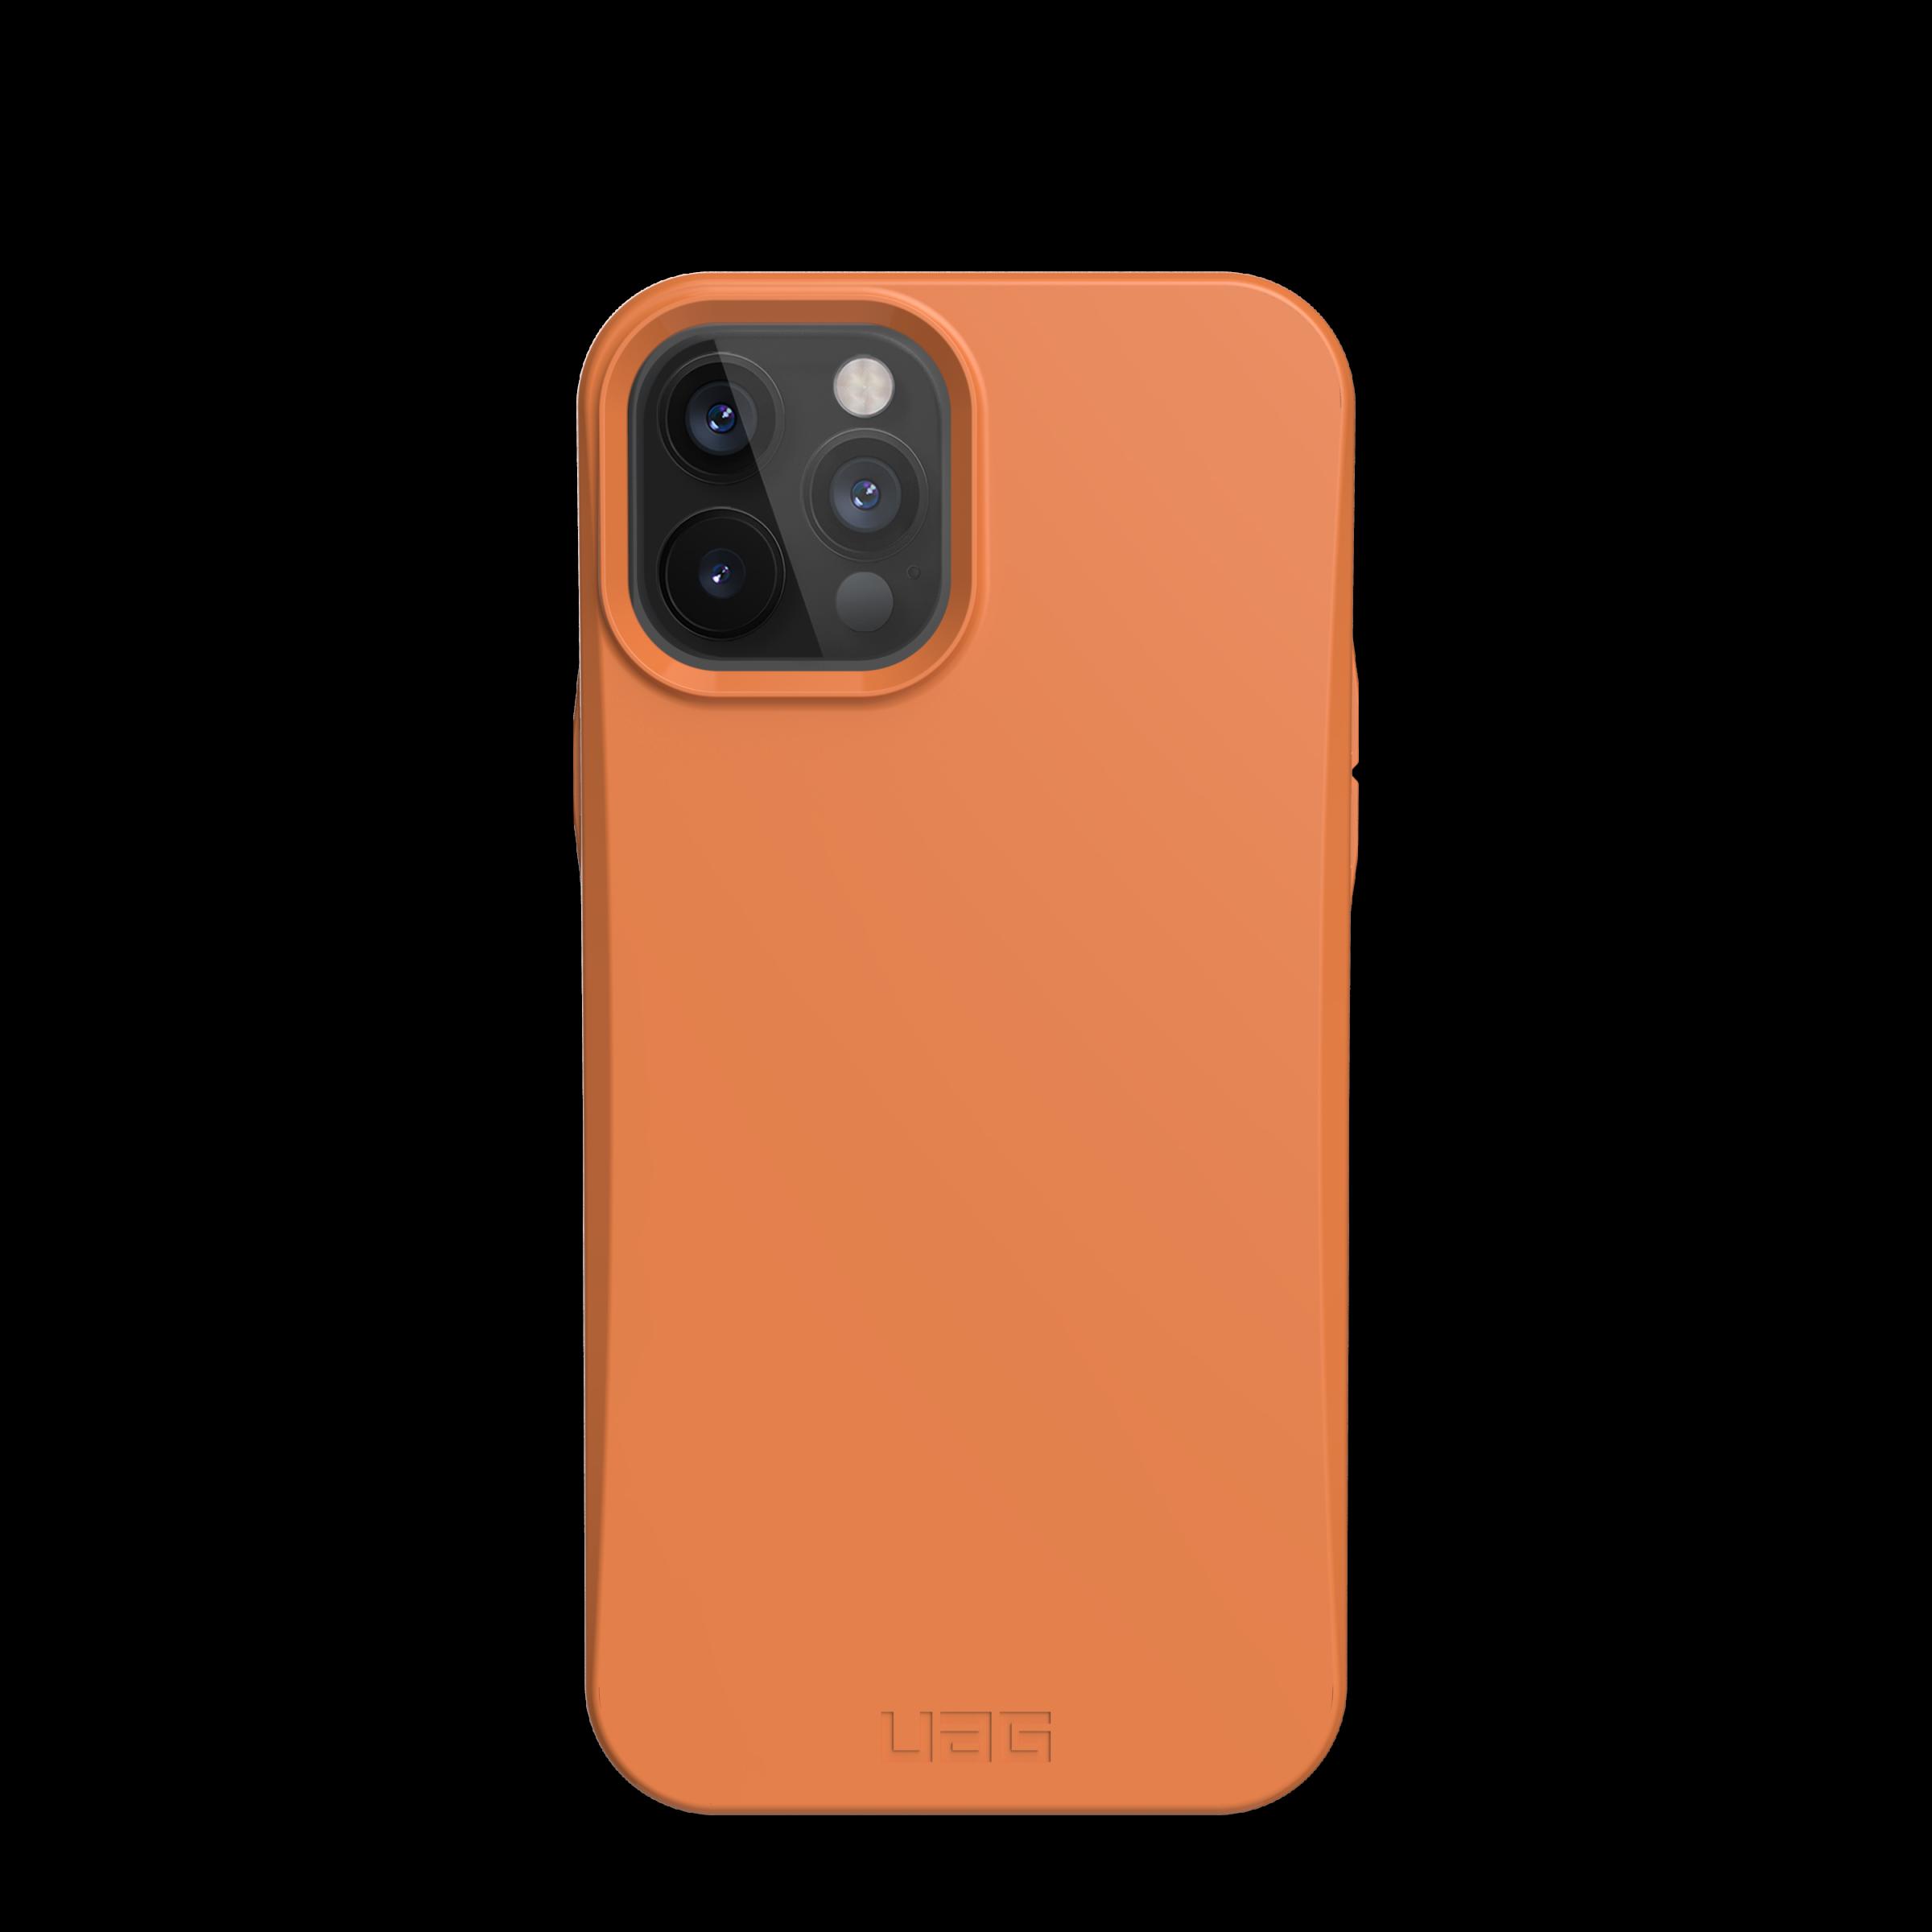 Outback Bio Case iPhone 12 Pro Max Orange